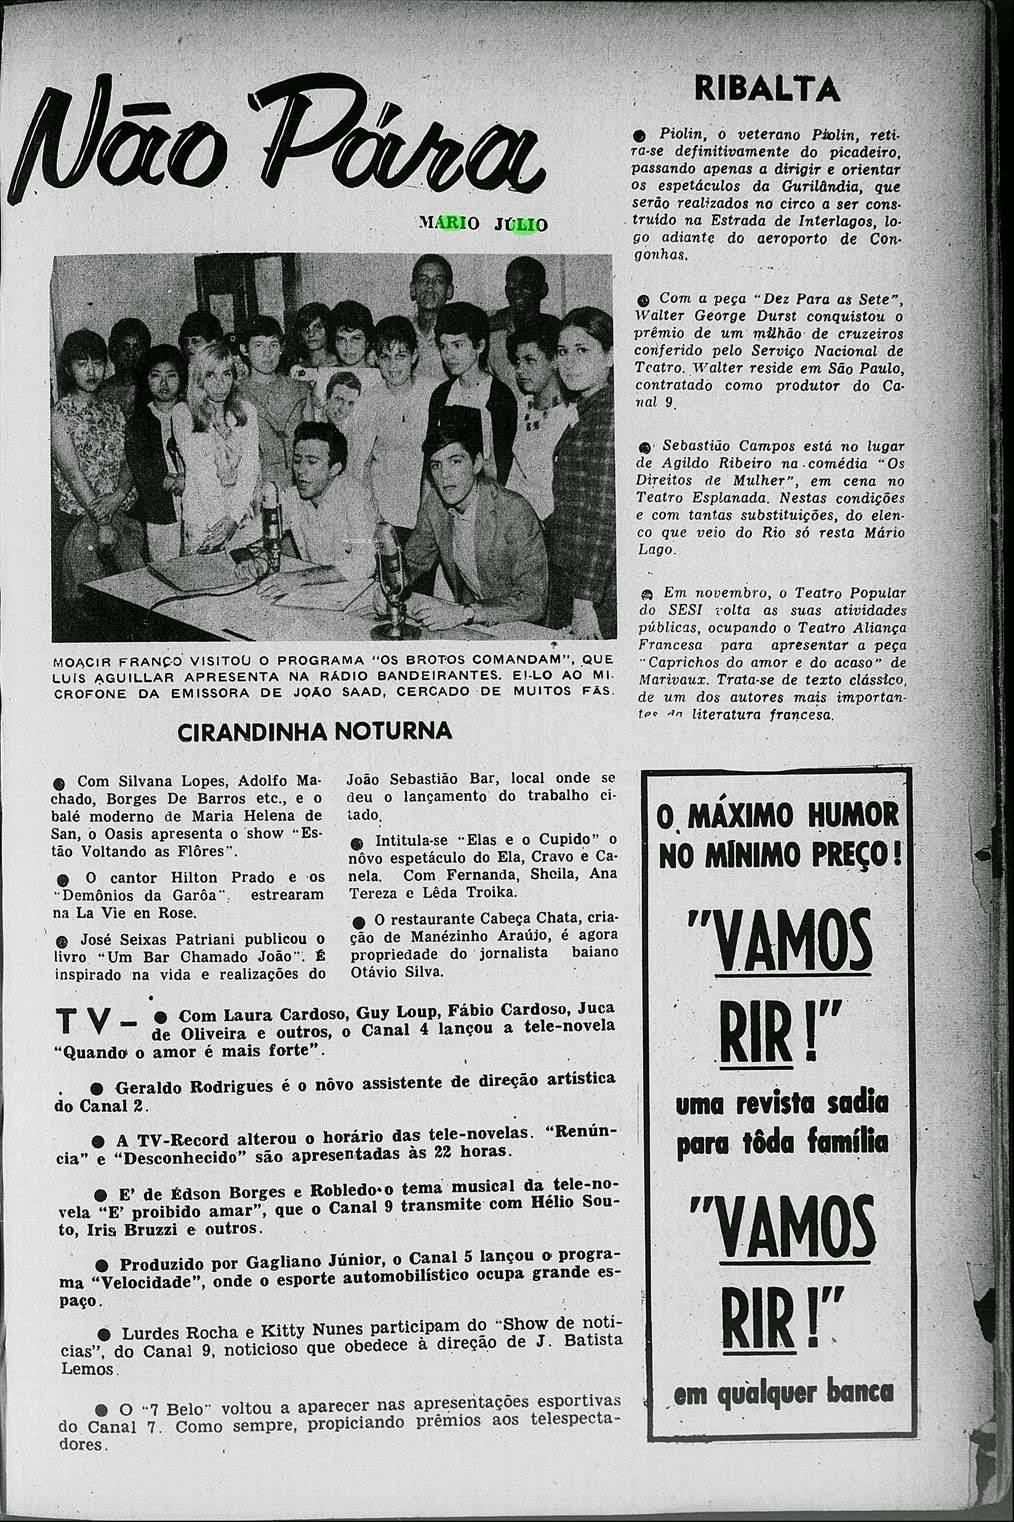 Sao Paulo in the 40s, 50s & 60s : 1965 Radio stations